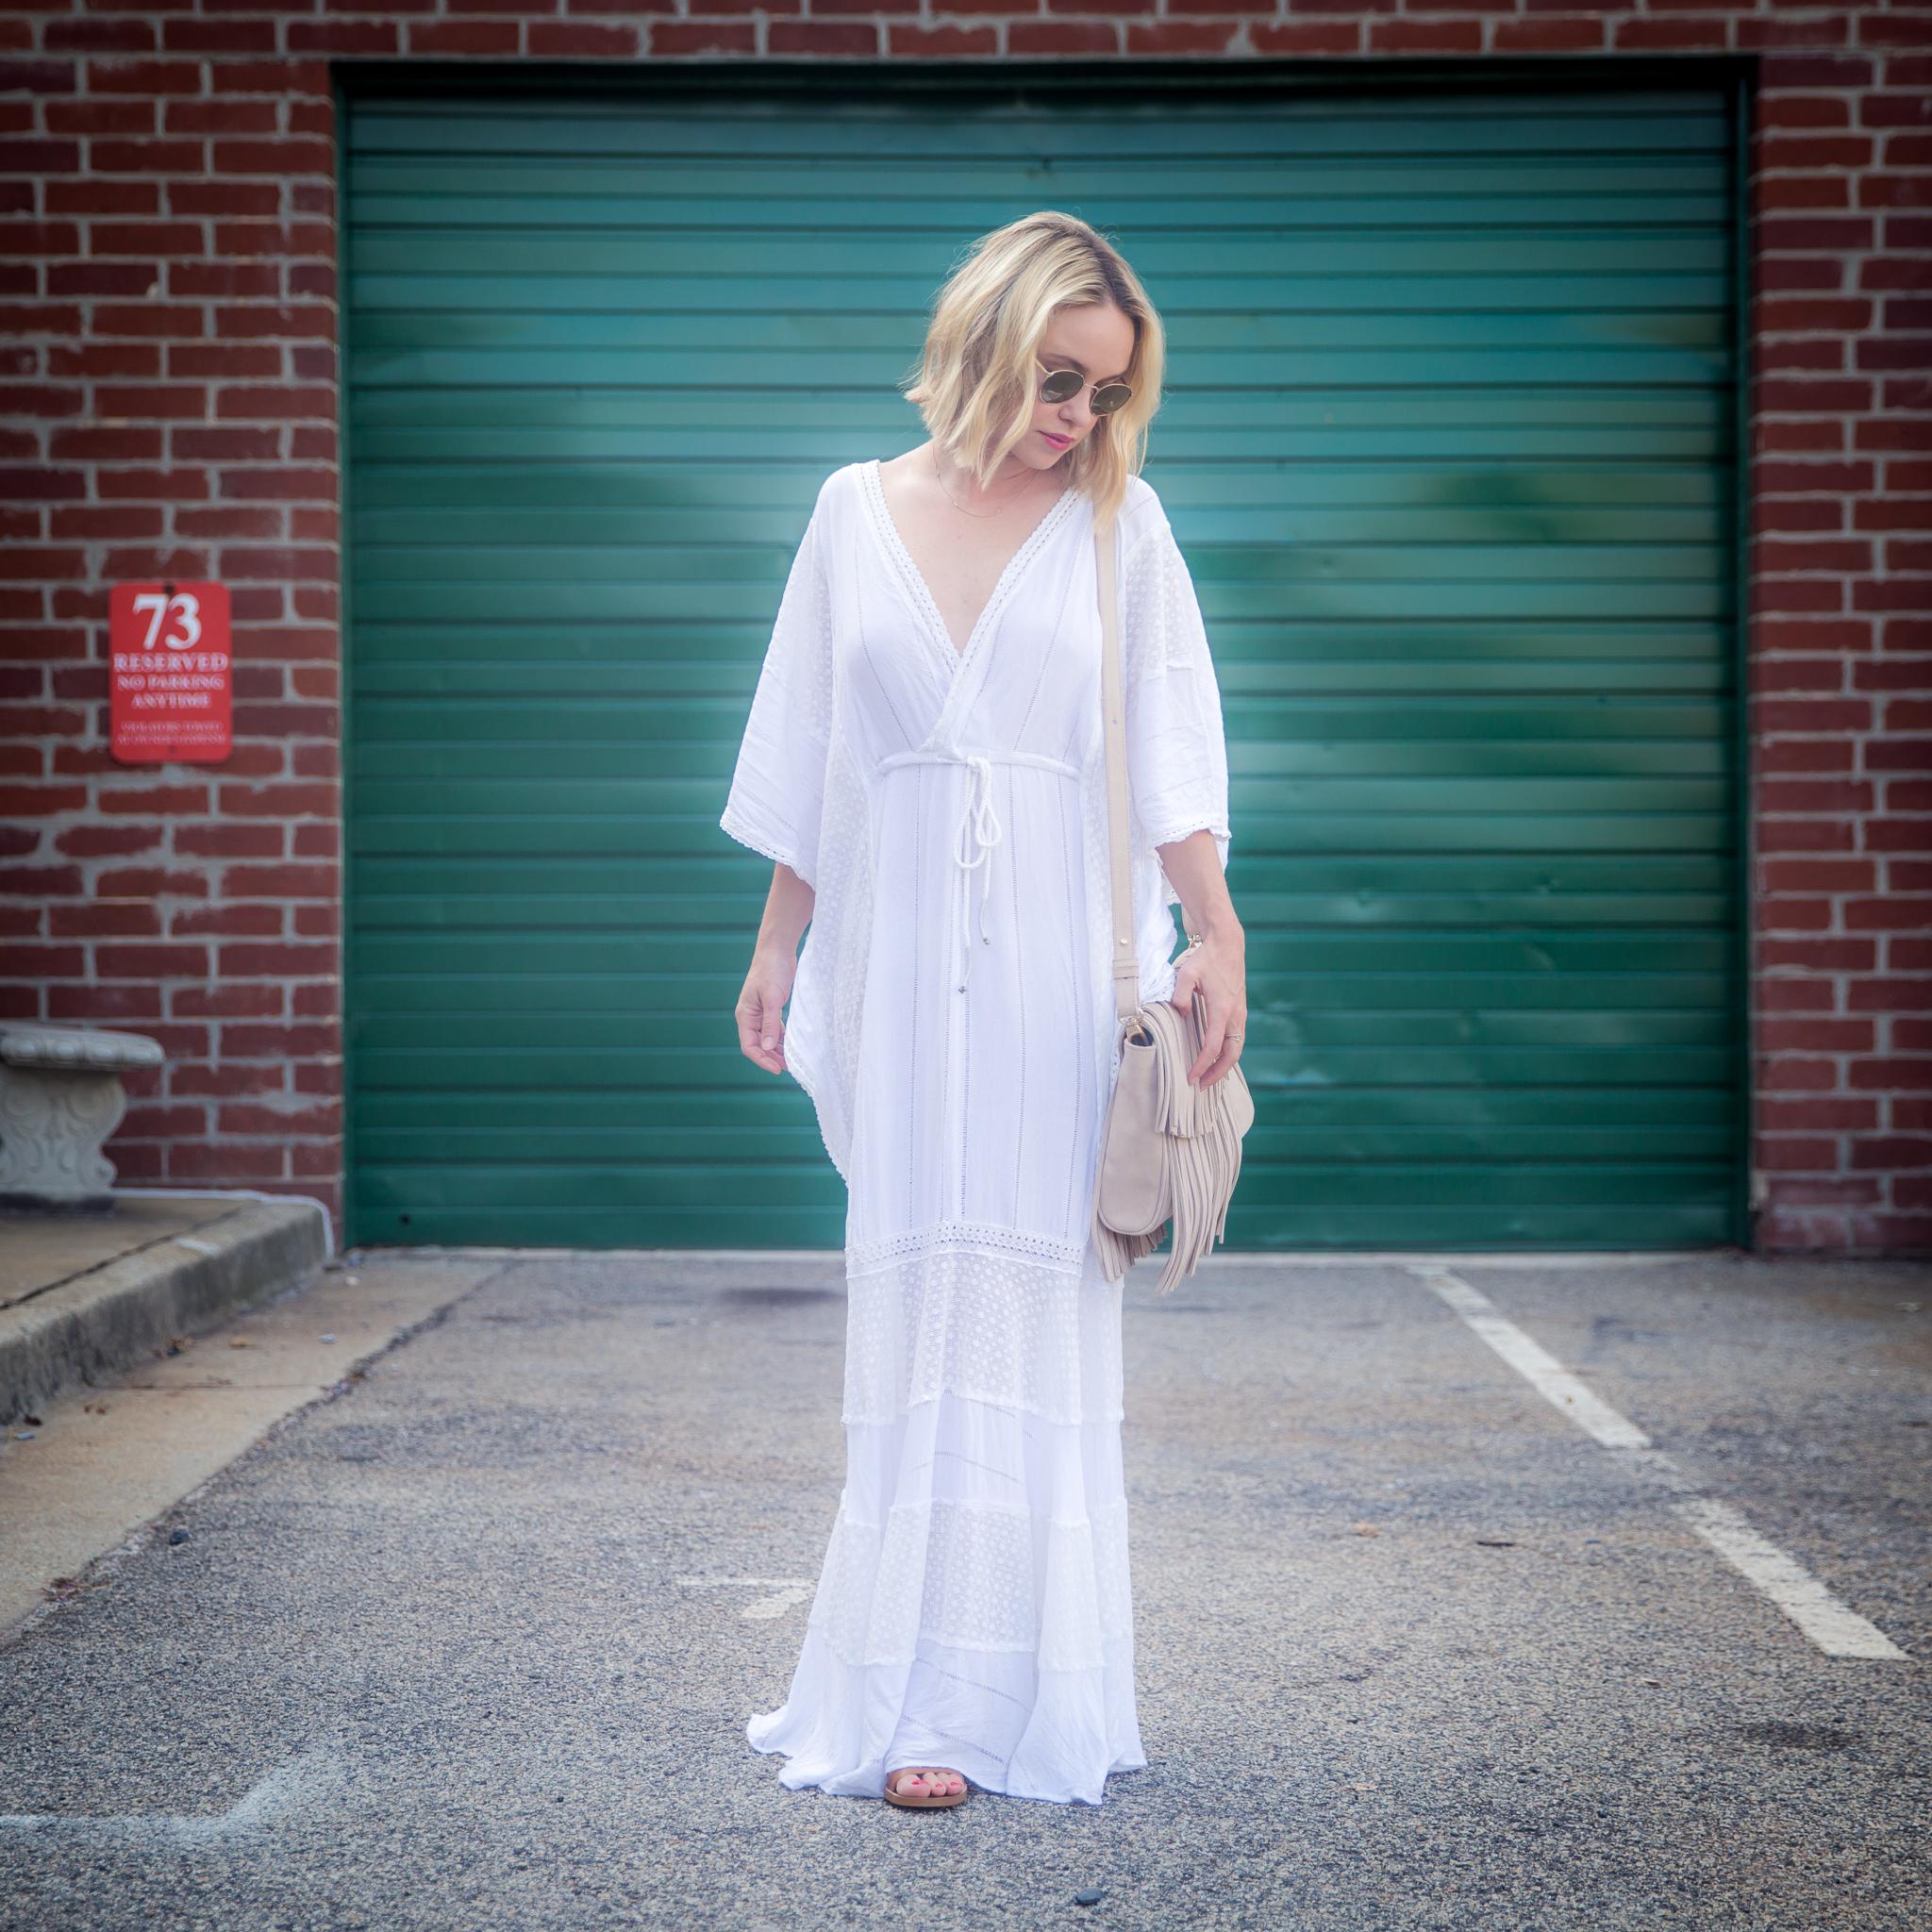 Becca-Tobin-iWally-July2015-1.jpg